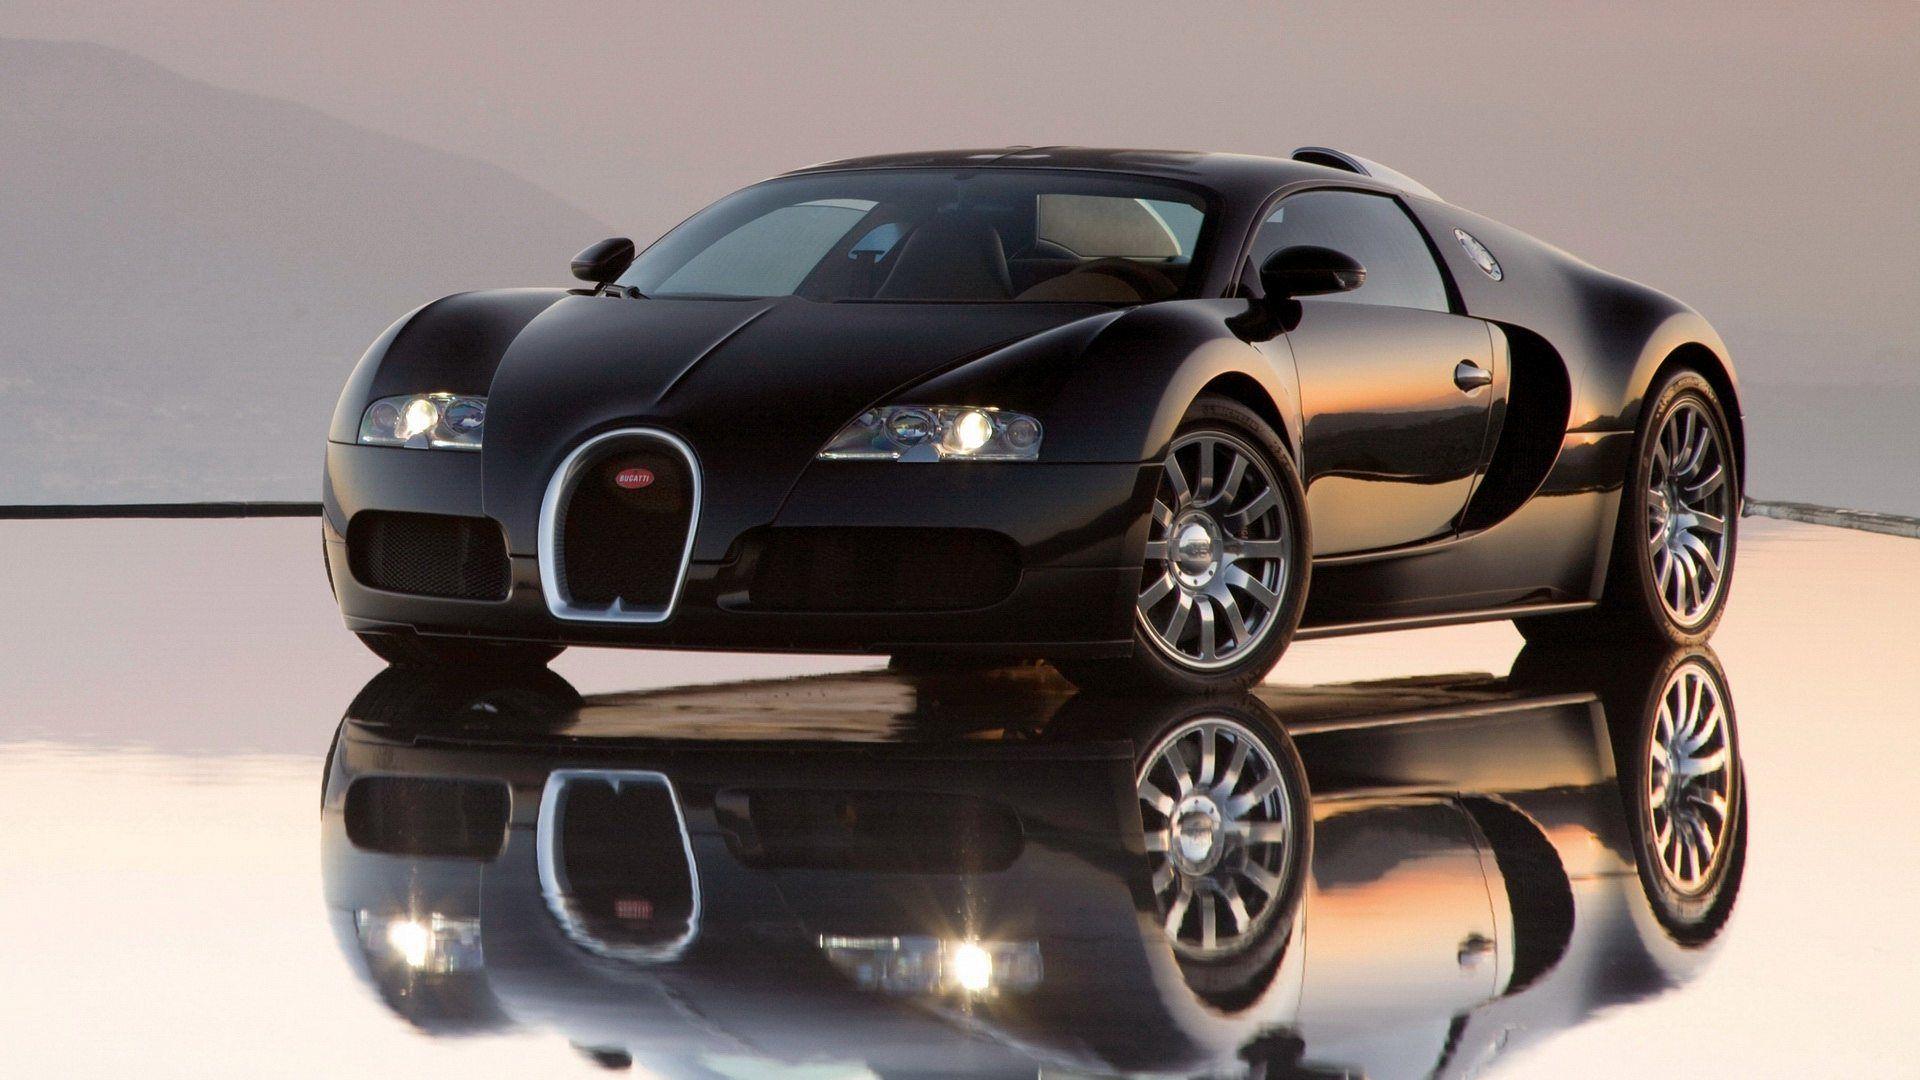 bugatti bugatti bugatti veyron wallpaper - Bugatti Veyron Wallpaper